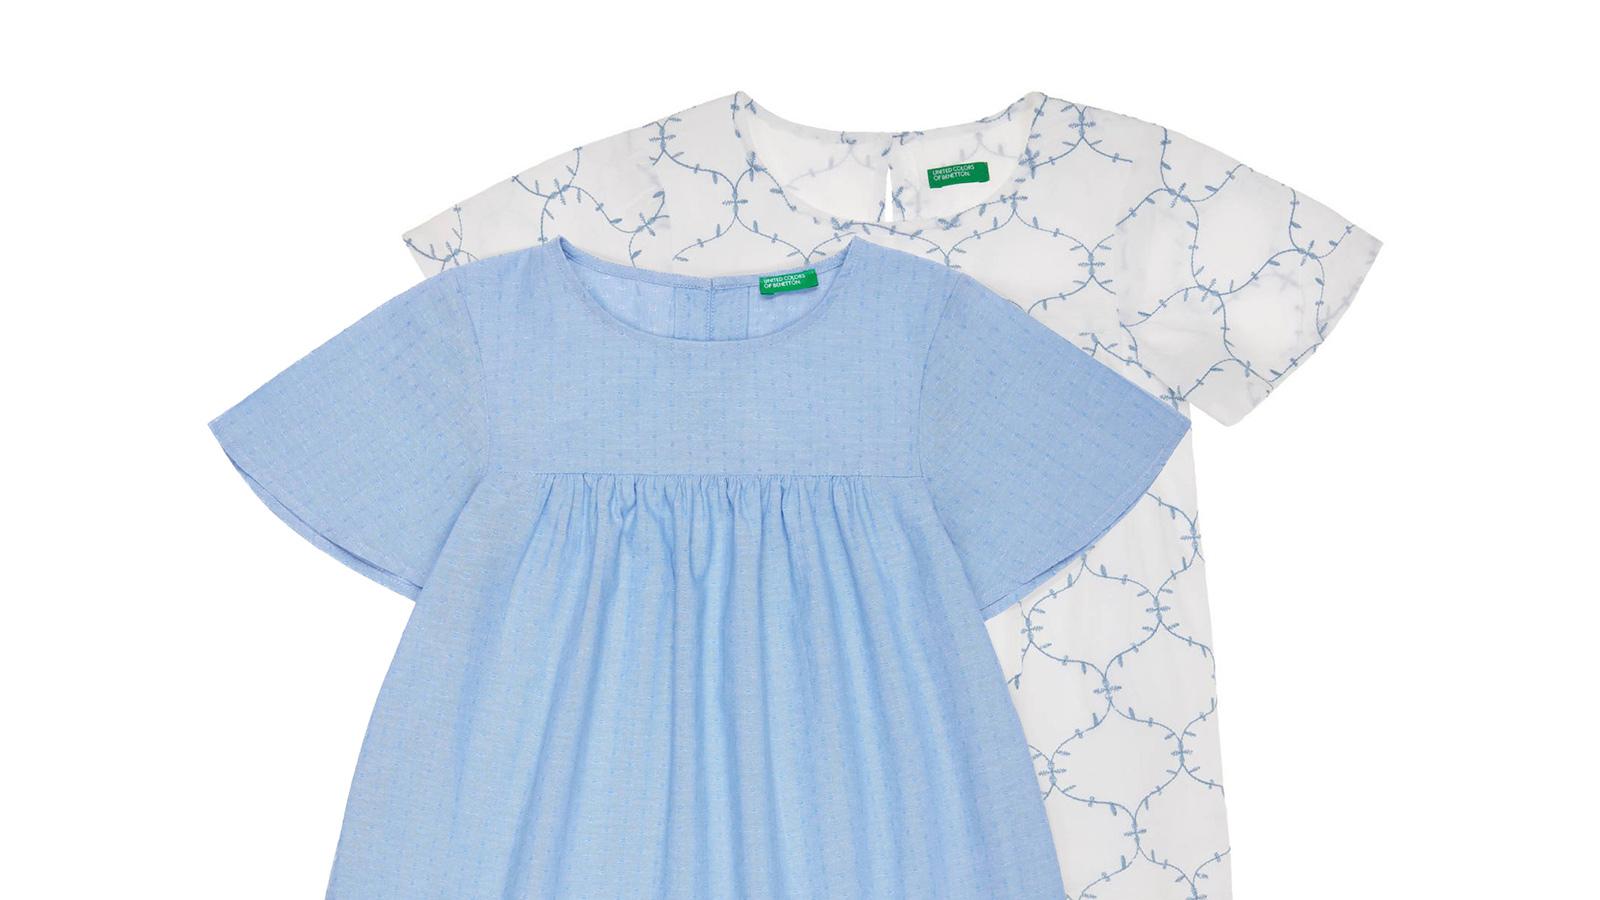 6724437c0 Apparel Girls Collection 2019 | Benetton